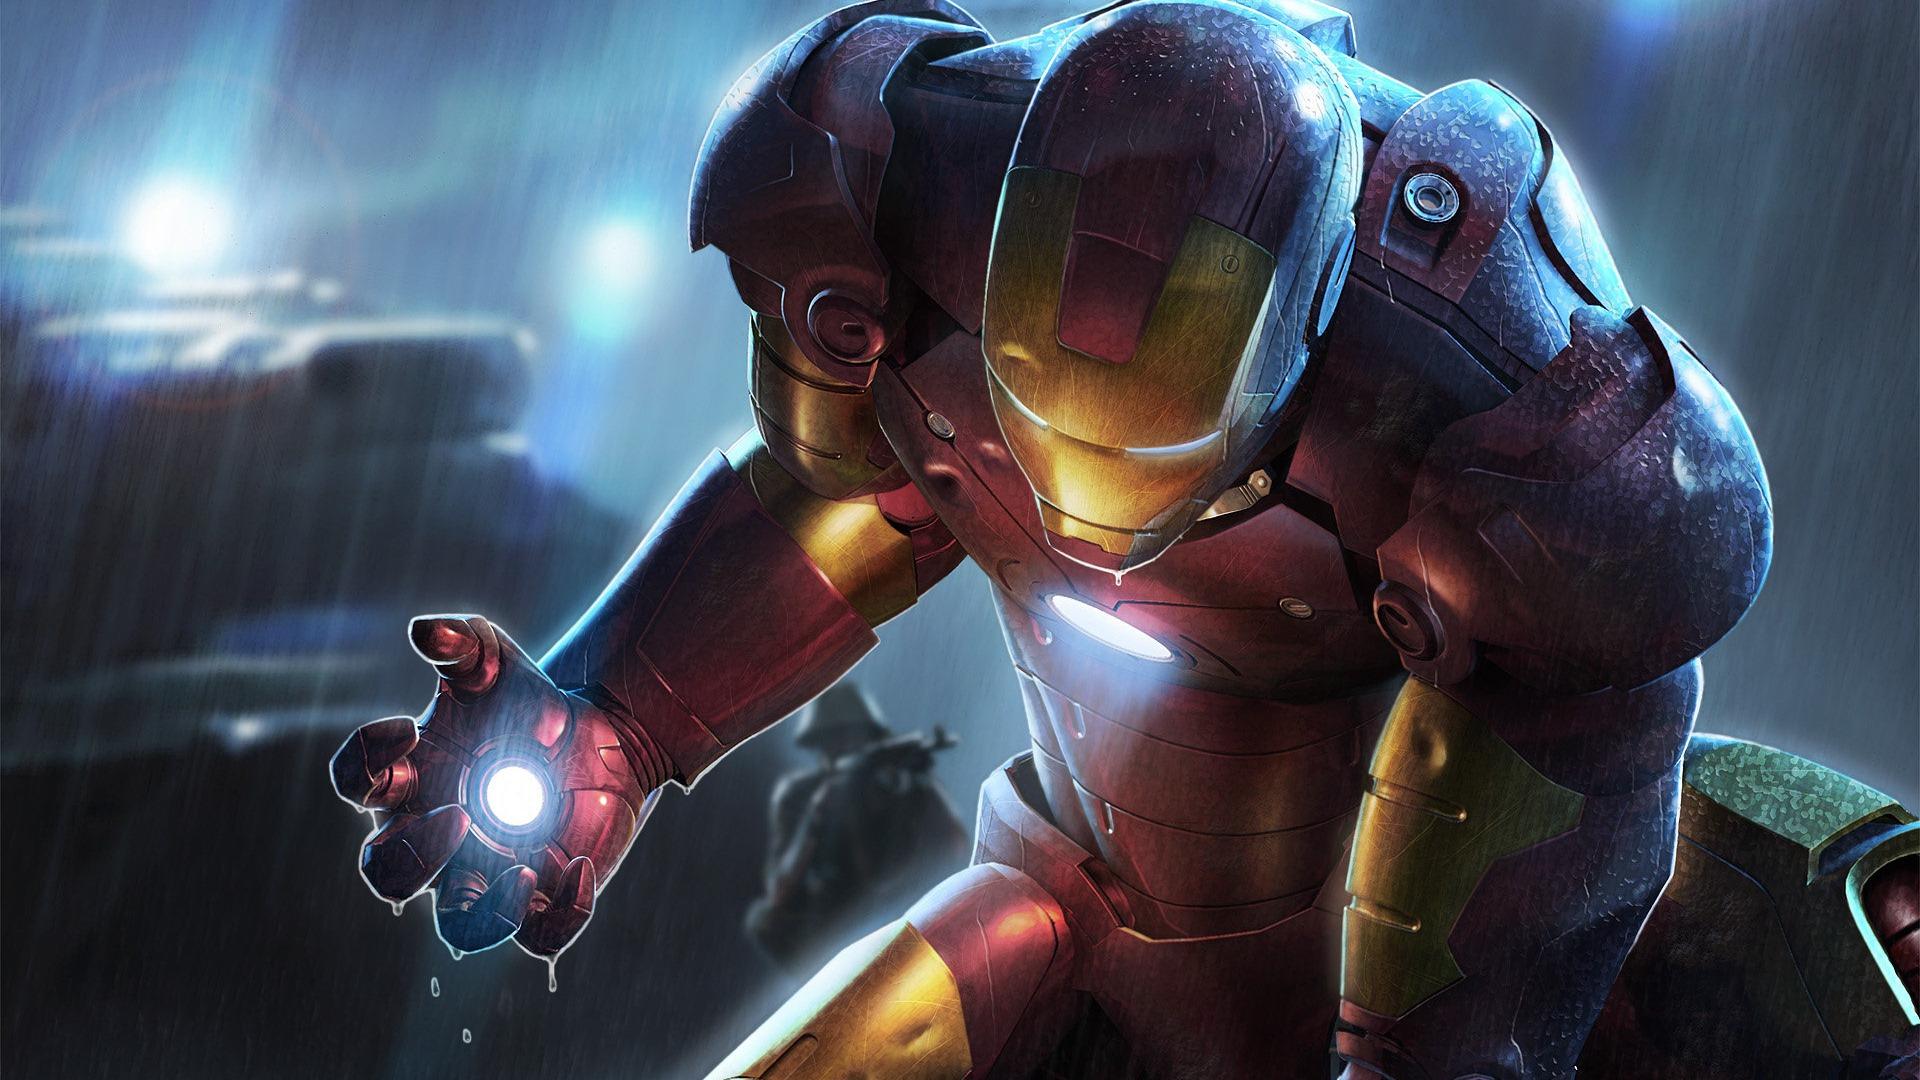 Iron Man 3 Hd Wallpapers 4 1920x1080 Wallpaper Download Iron